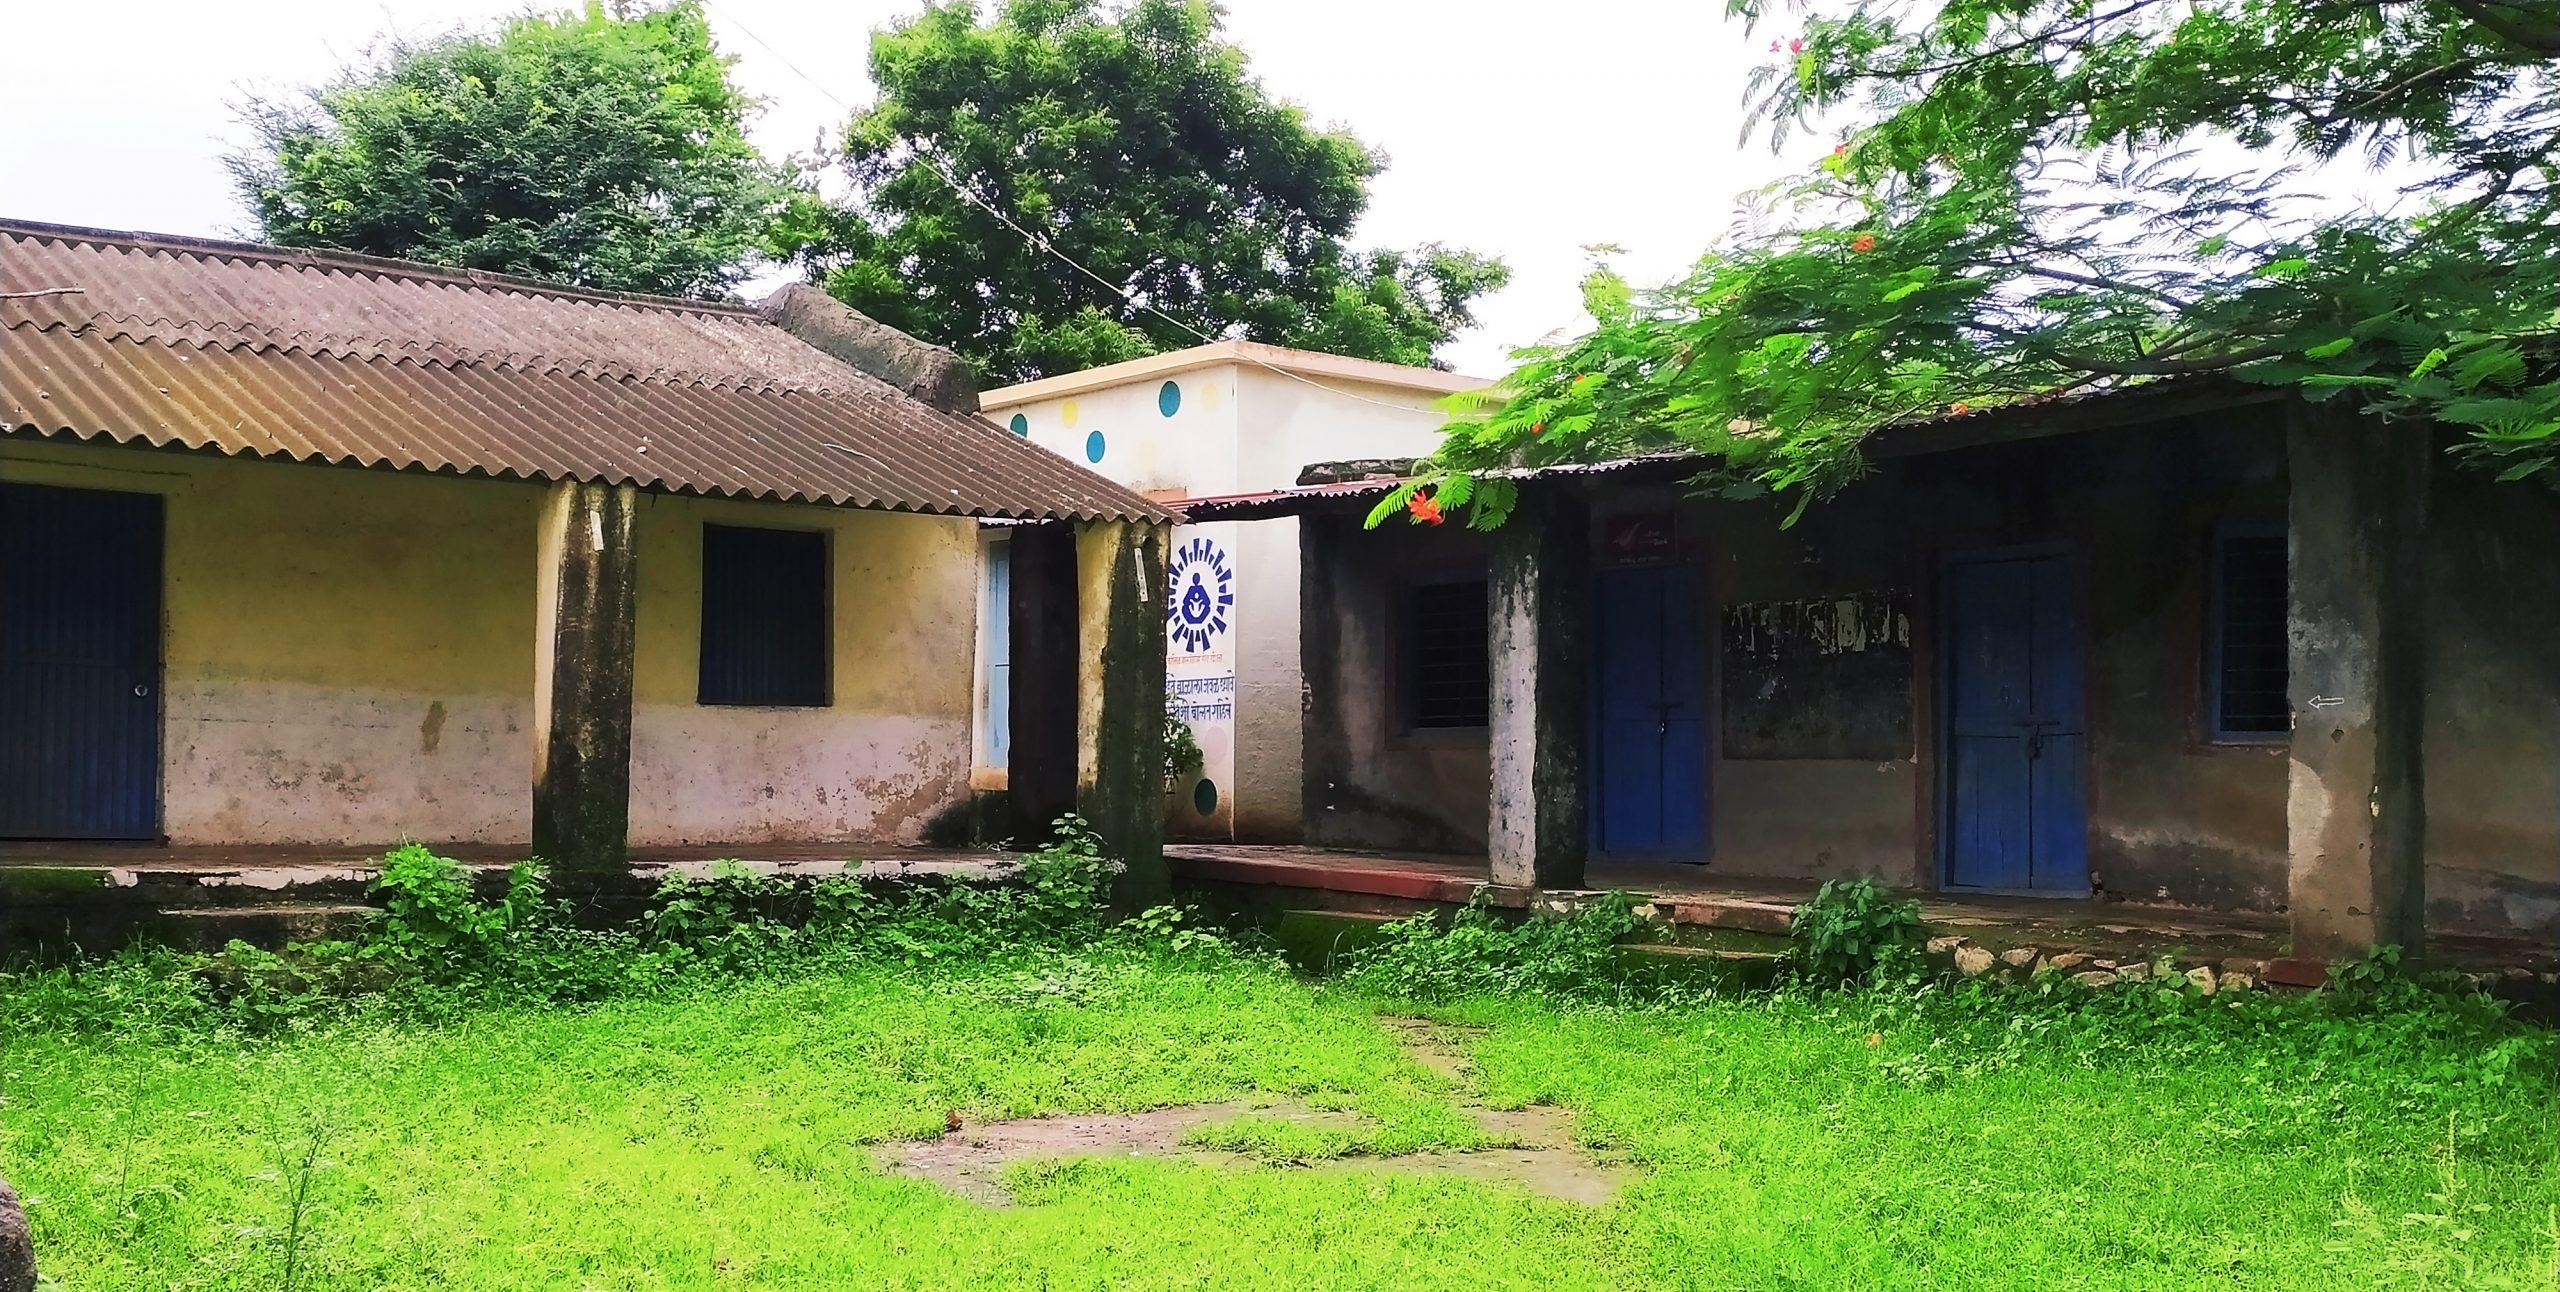 An old school